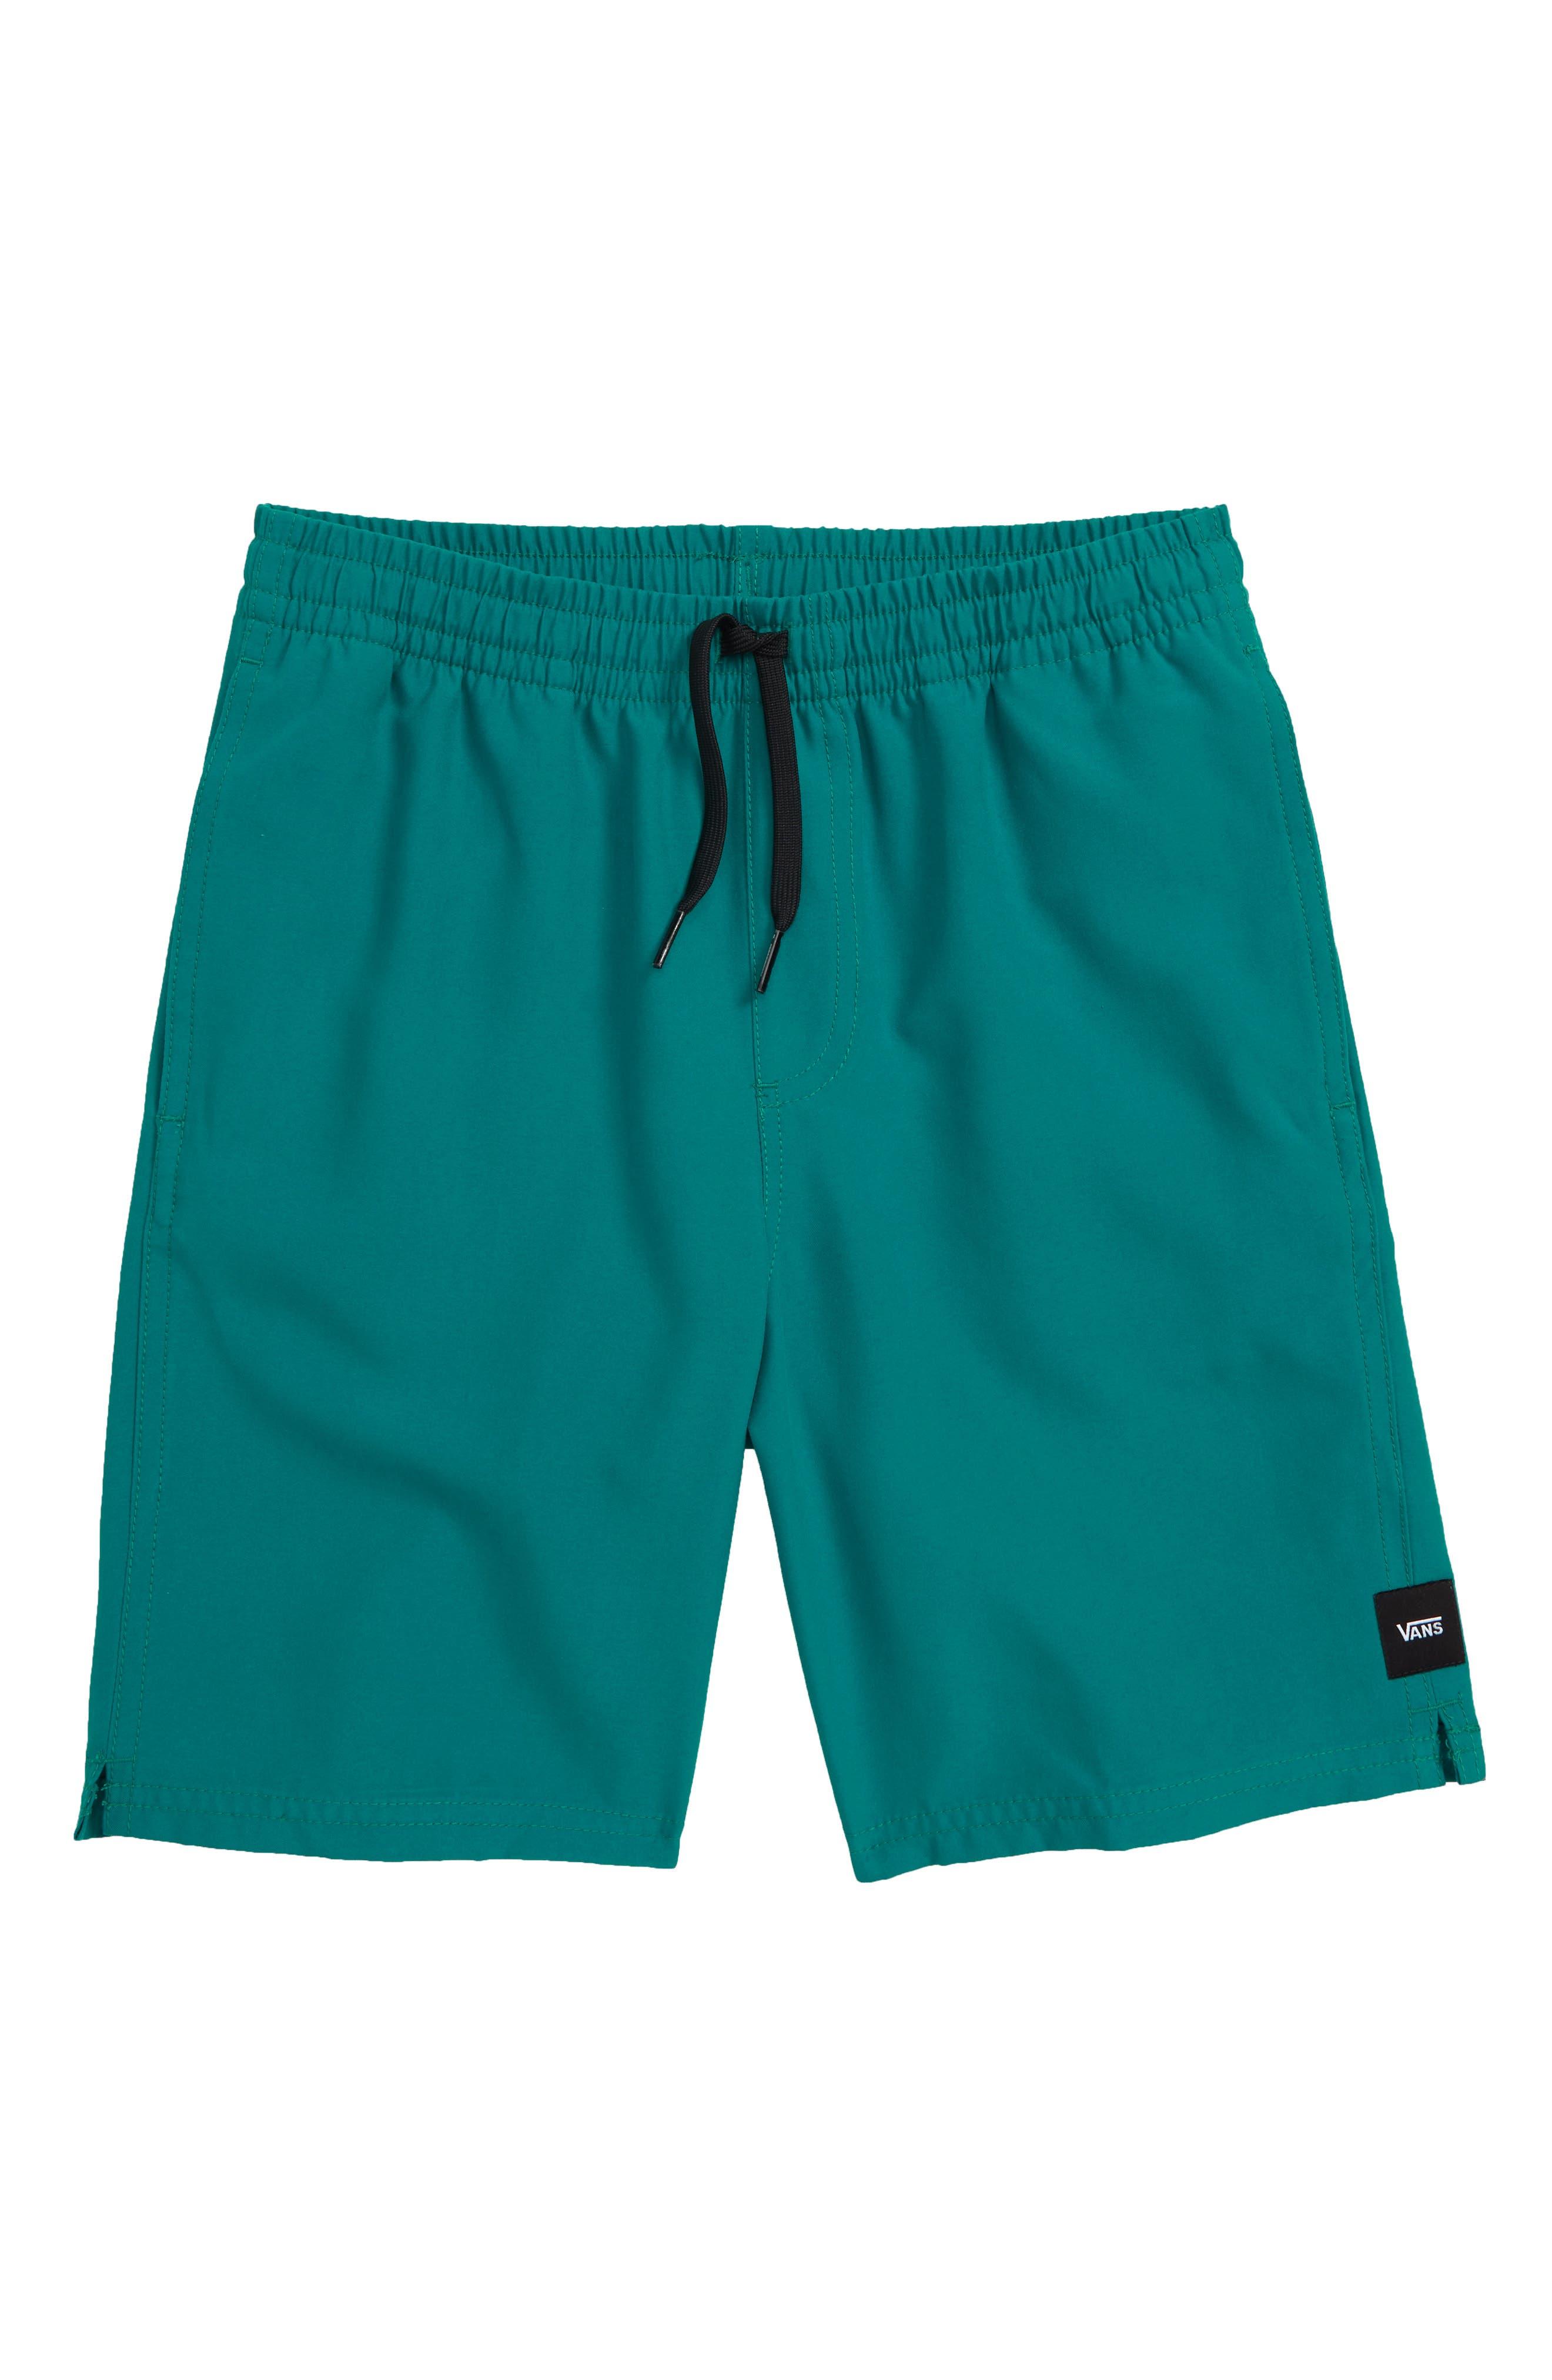 VANS,                             Primary Decksider Volley Shorts,                             Main thumbnail 1, color,                             QUETZAL